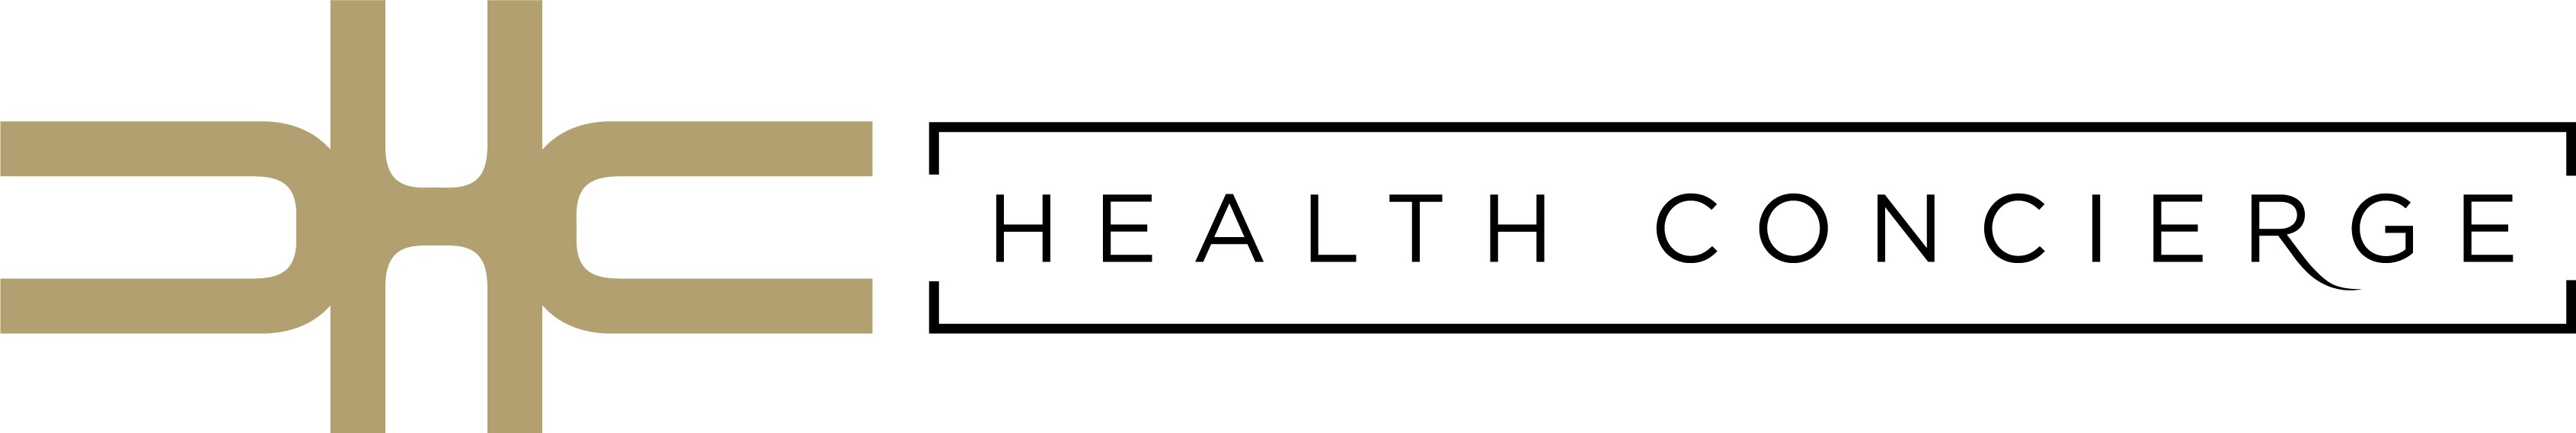 Health Concierge | LinkedIn